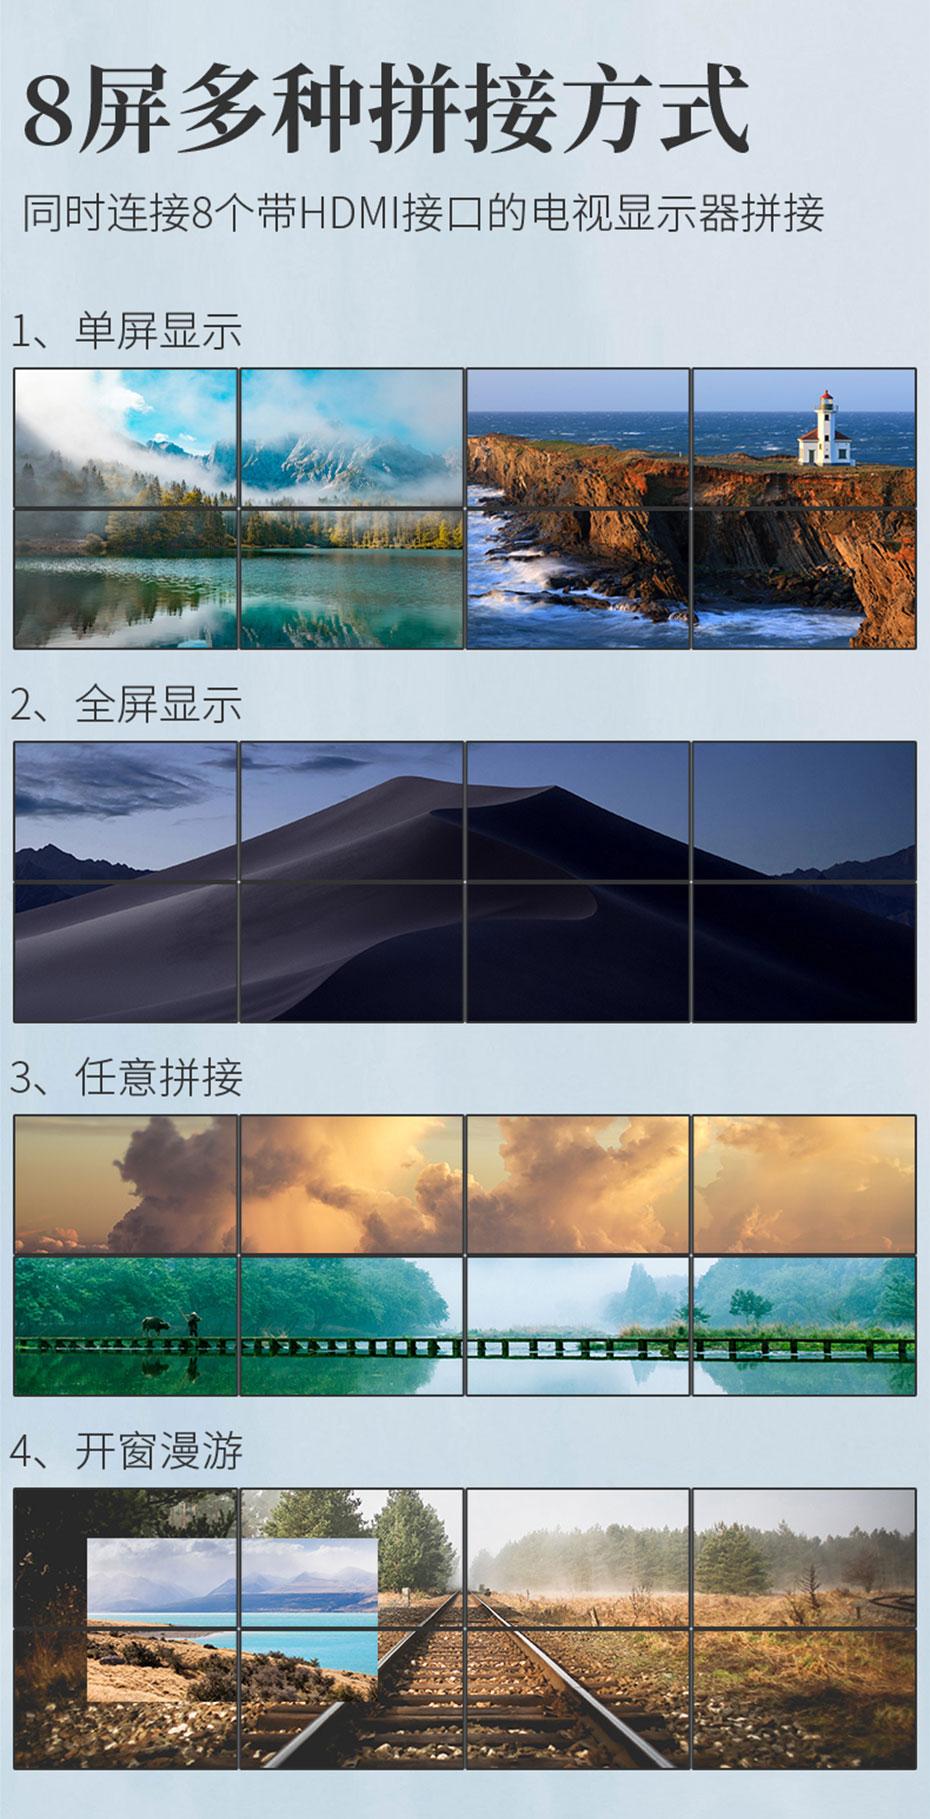 HDMI多屏/多画面拼接处理器HD218支持多种拼接模式